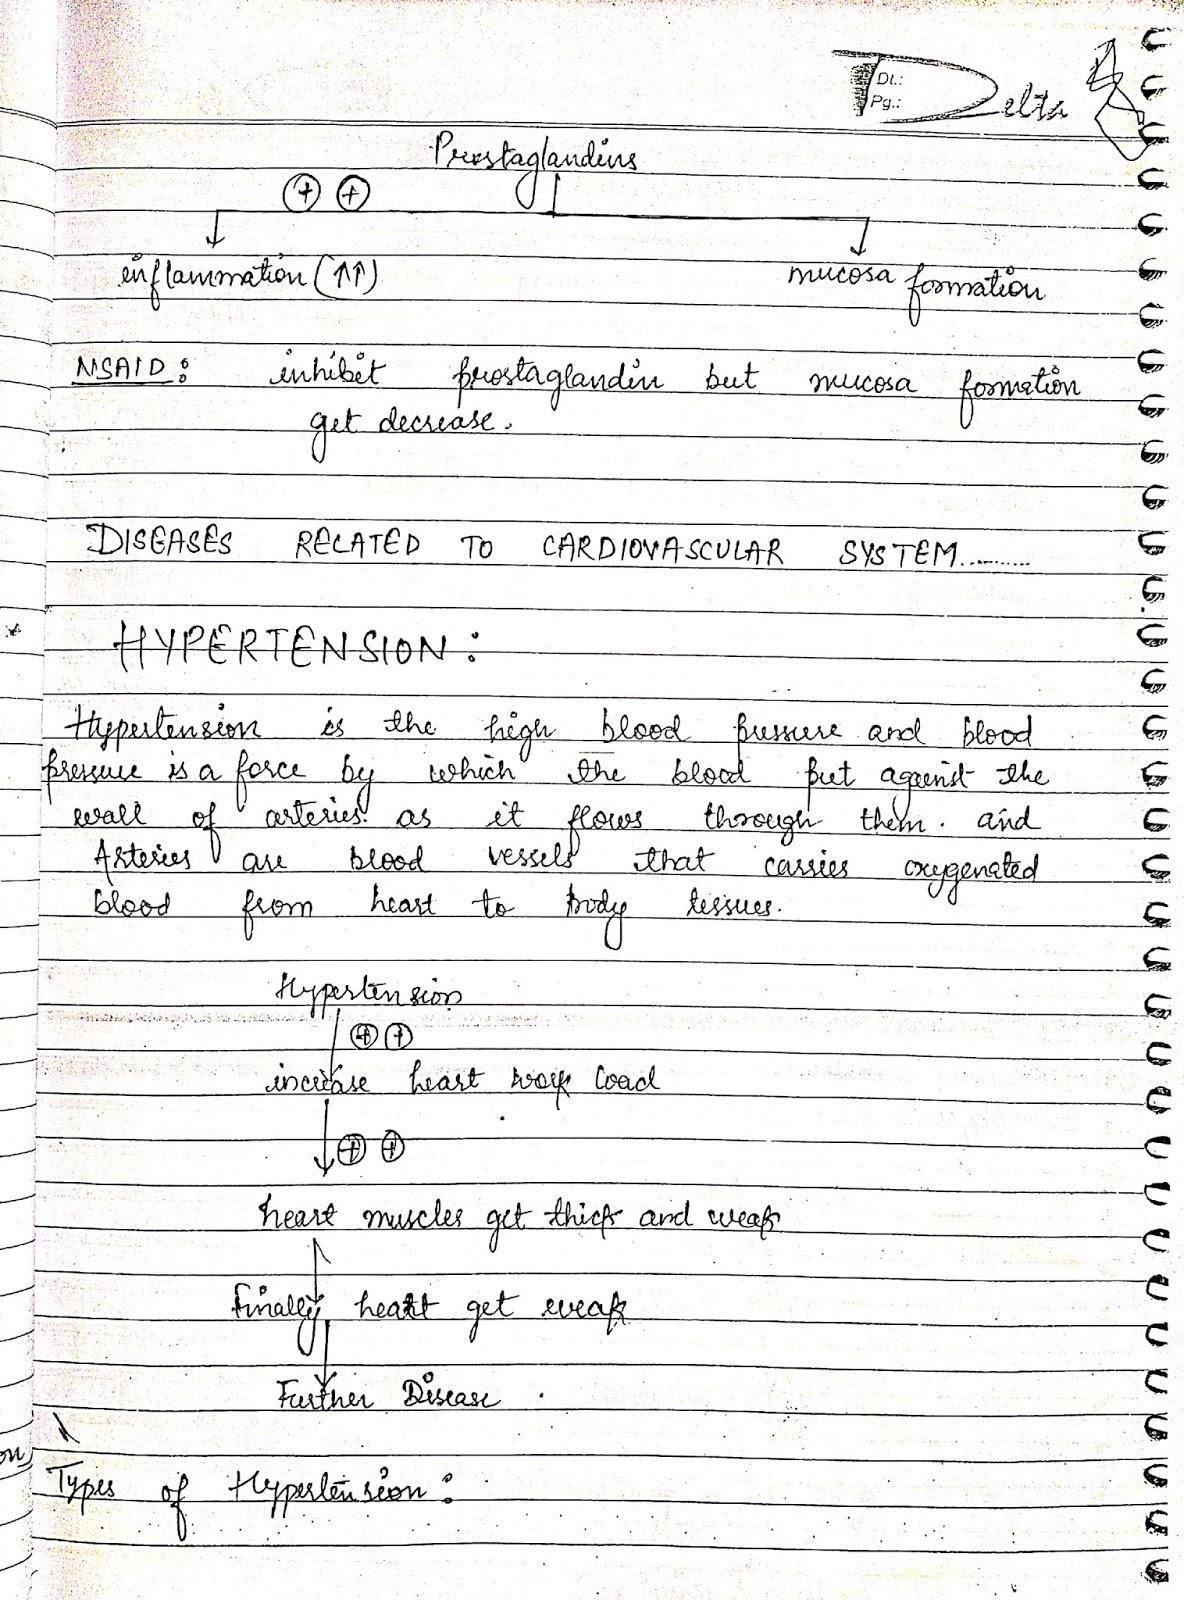 pathophysiology - hypertension